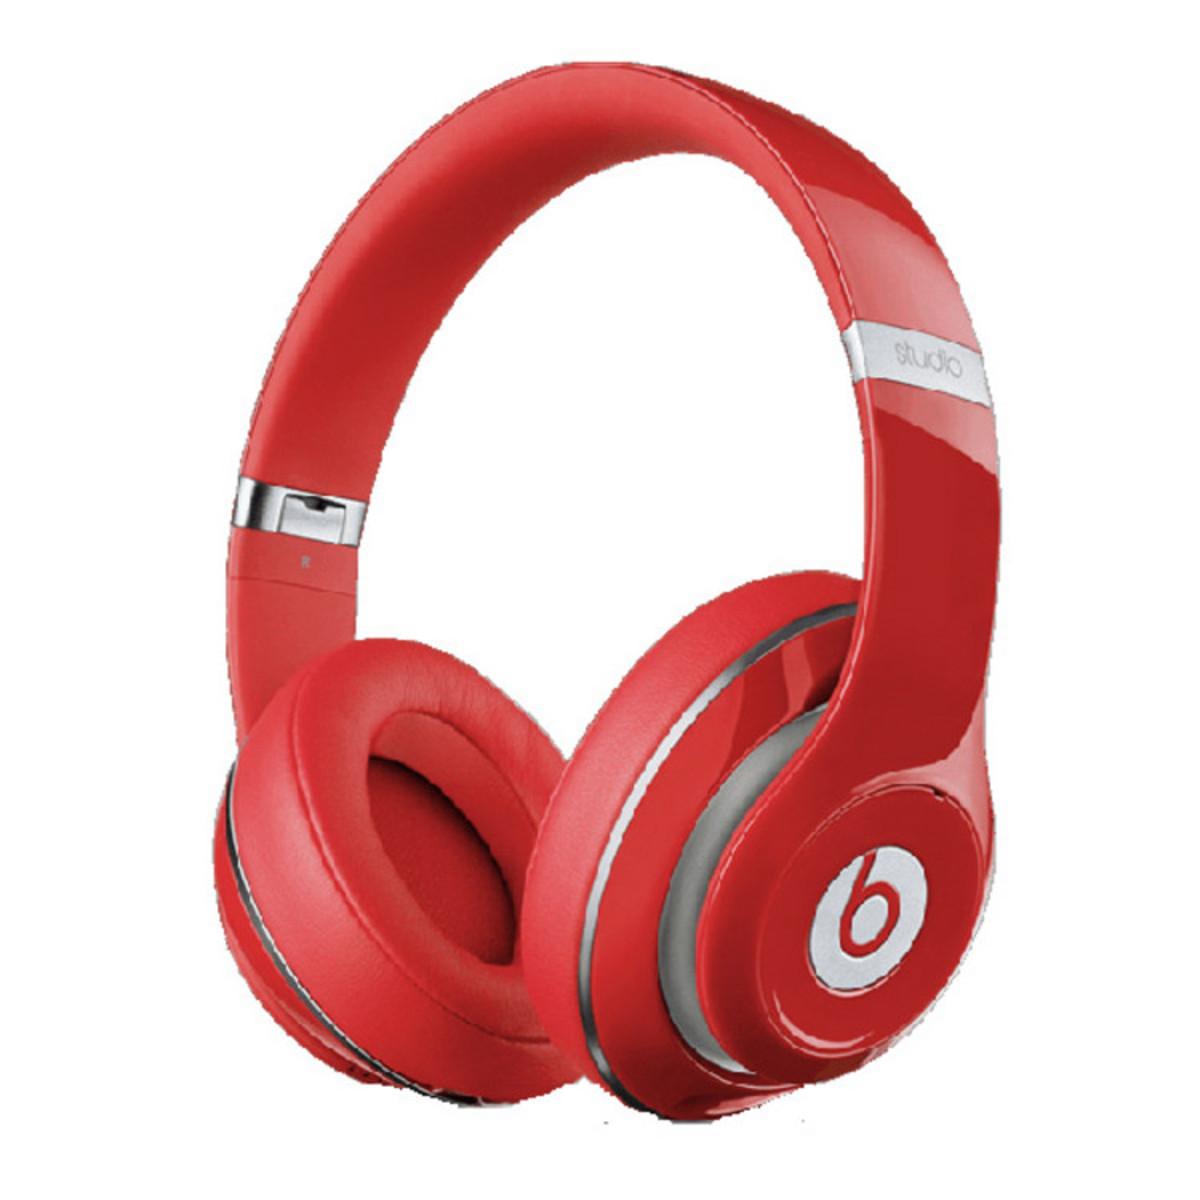 disc beats studio 2 0 over ear headphones red at. Black Bedroom Furniture Sets. Home Design Ideas